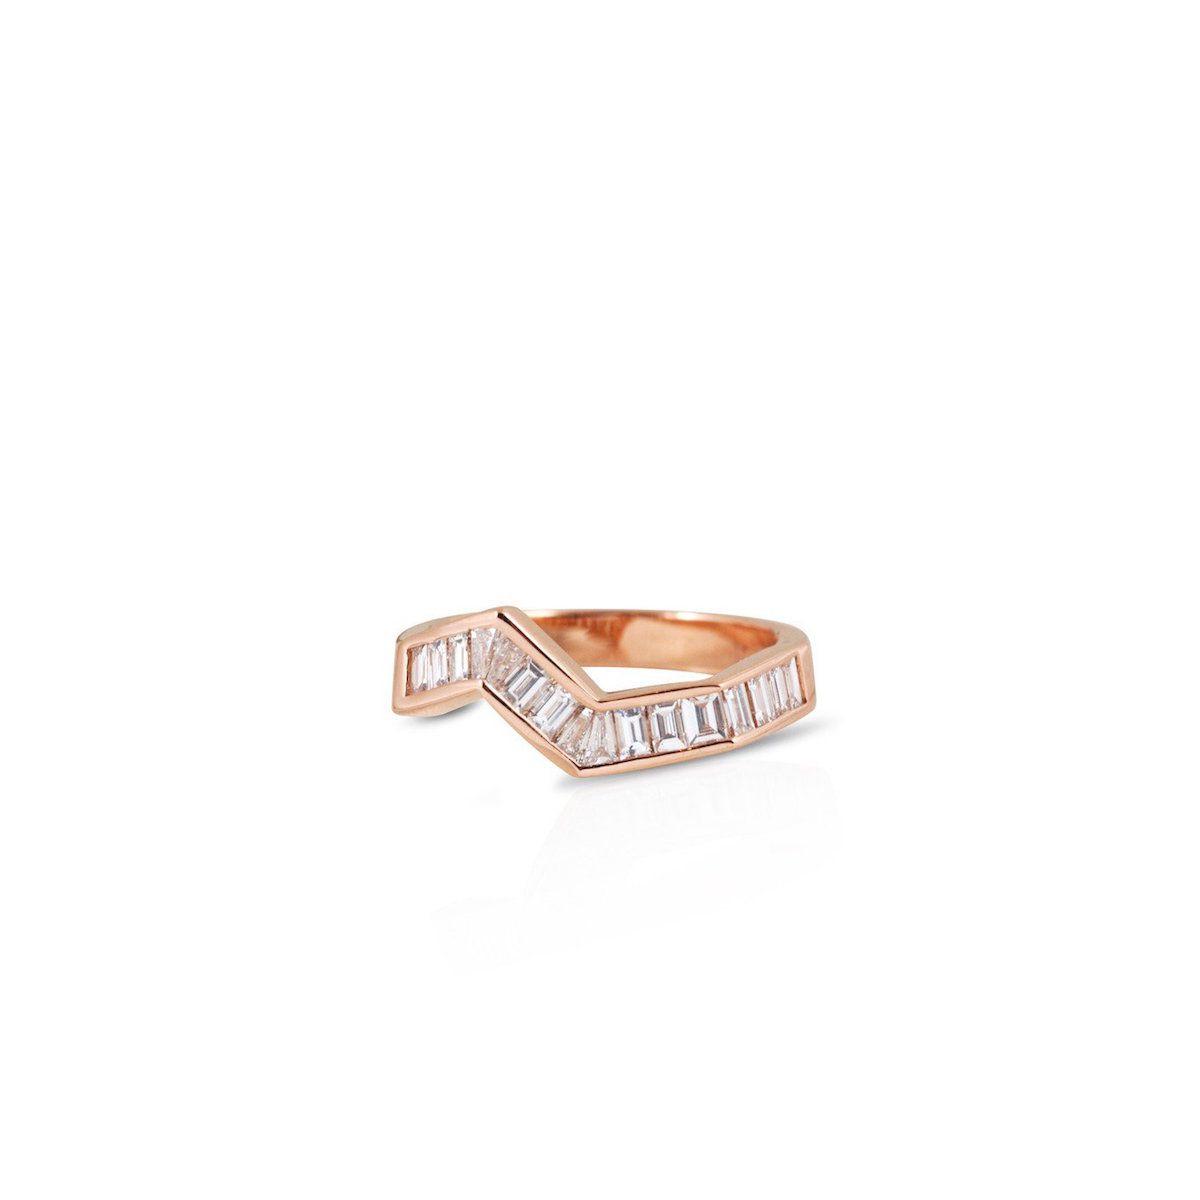 Kavant & Sharart Origami Ziggy Diamond Ring in Rose Gold